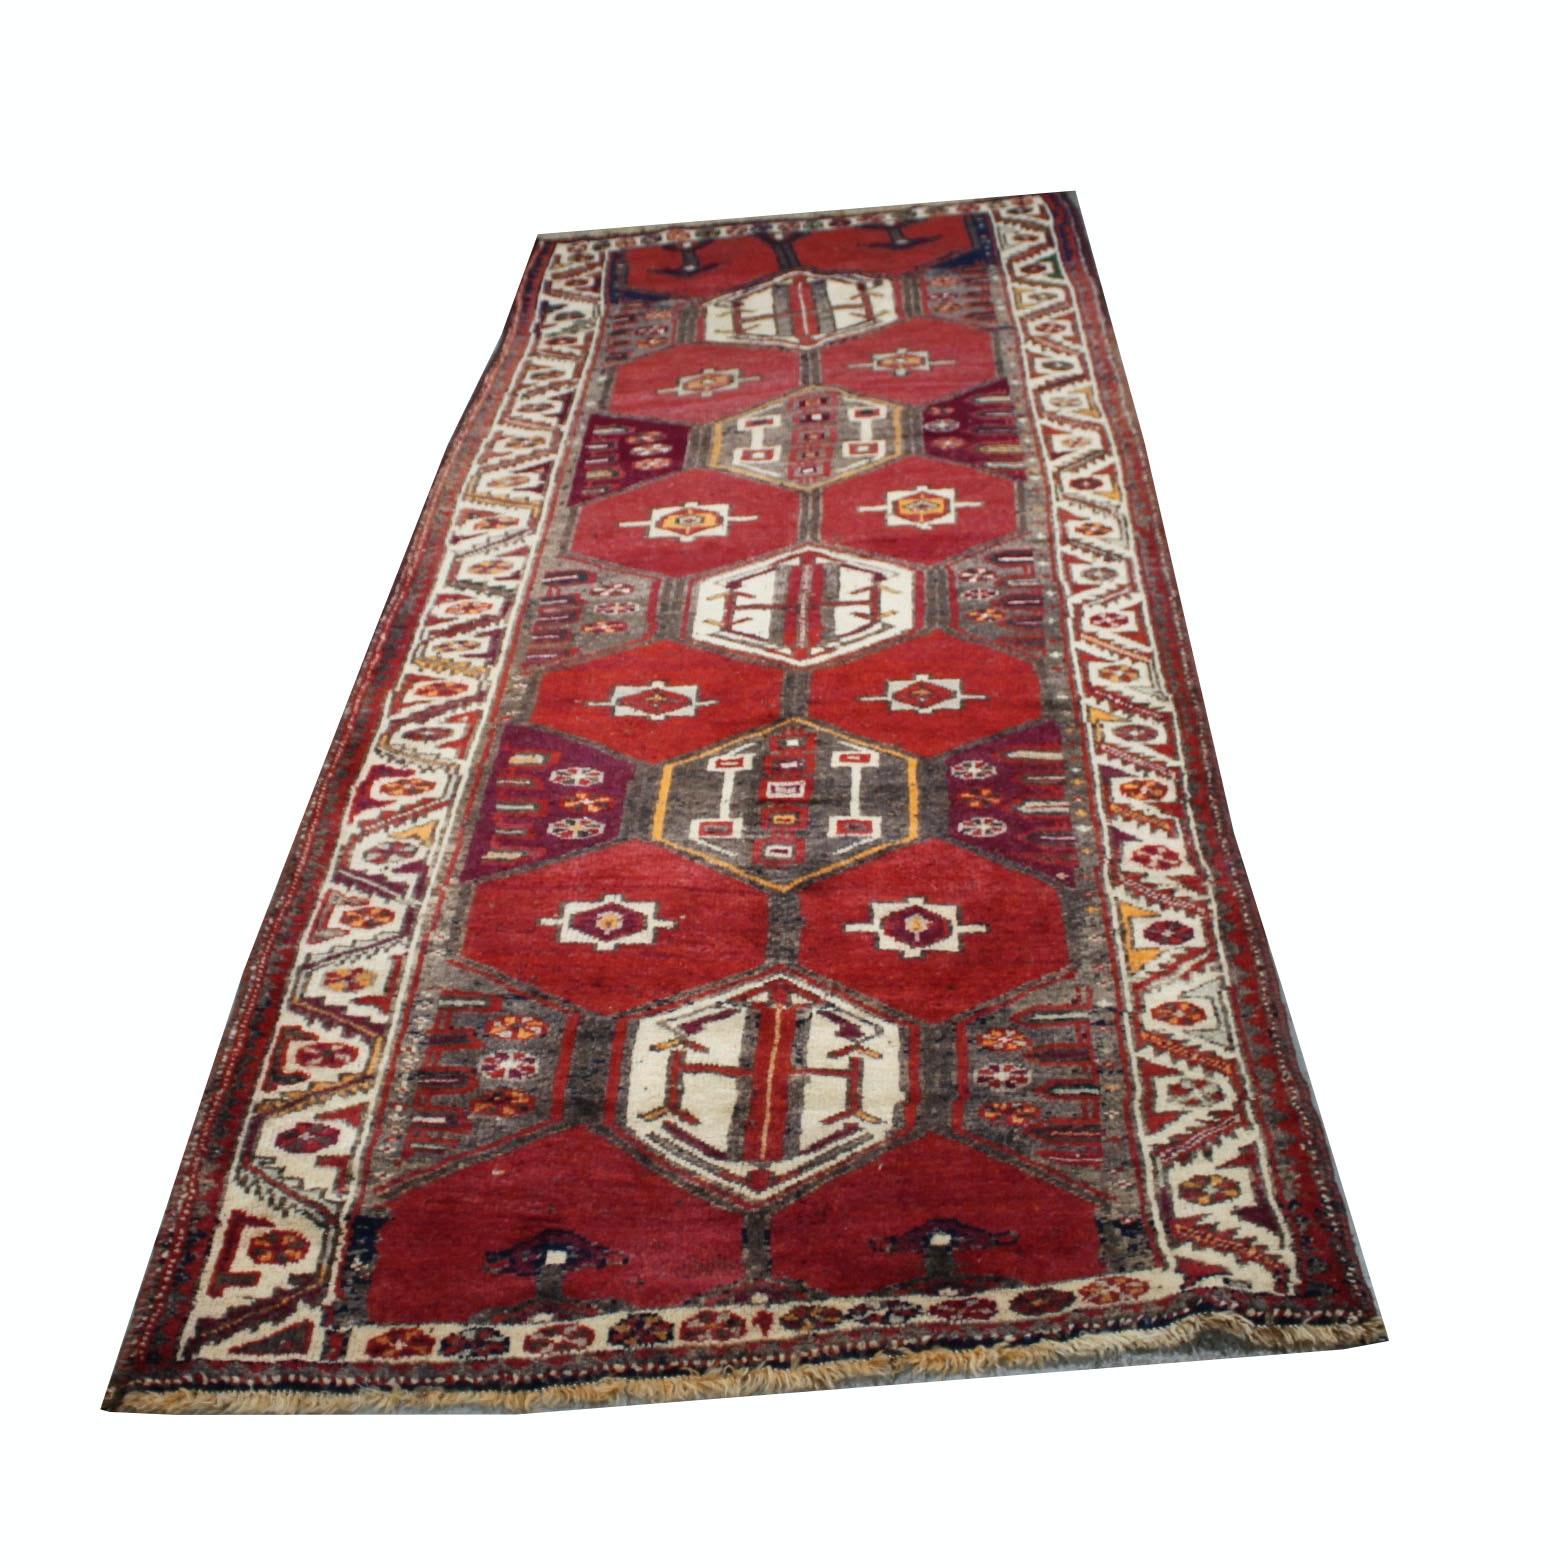 Vintage Hand-Knotted Persian Karaja Heriz Wool Carpet Runner